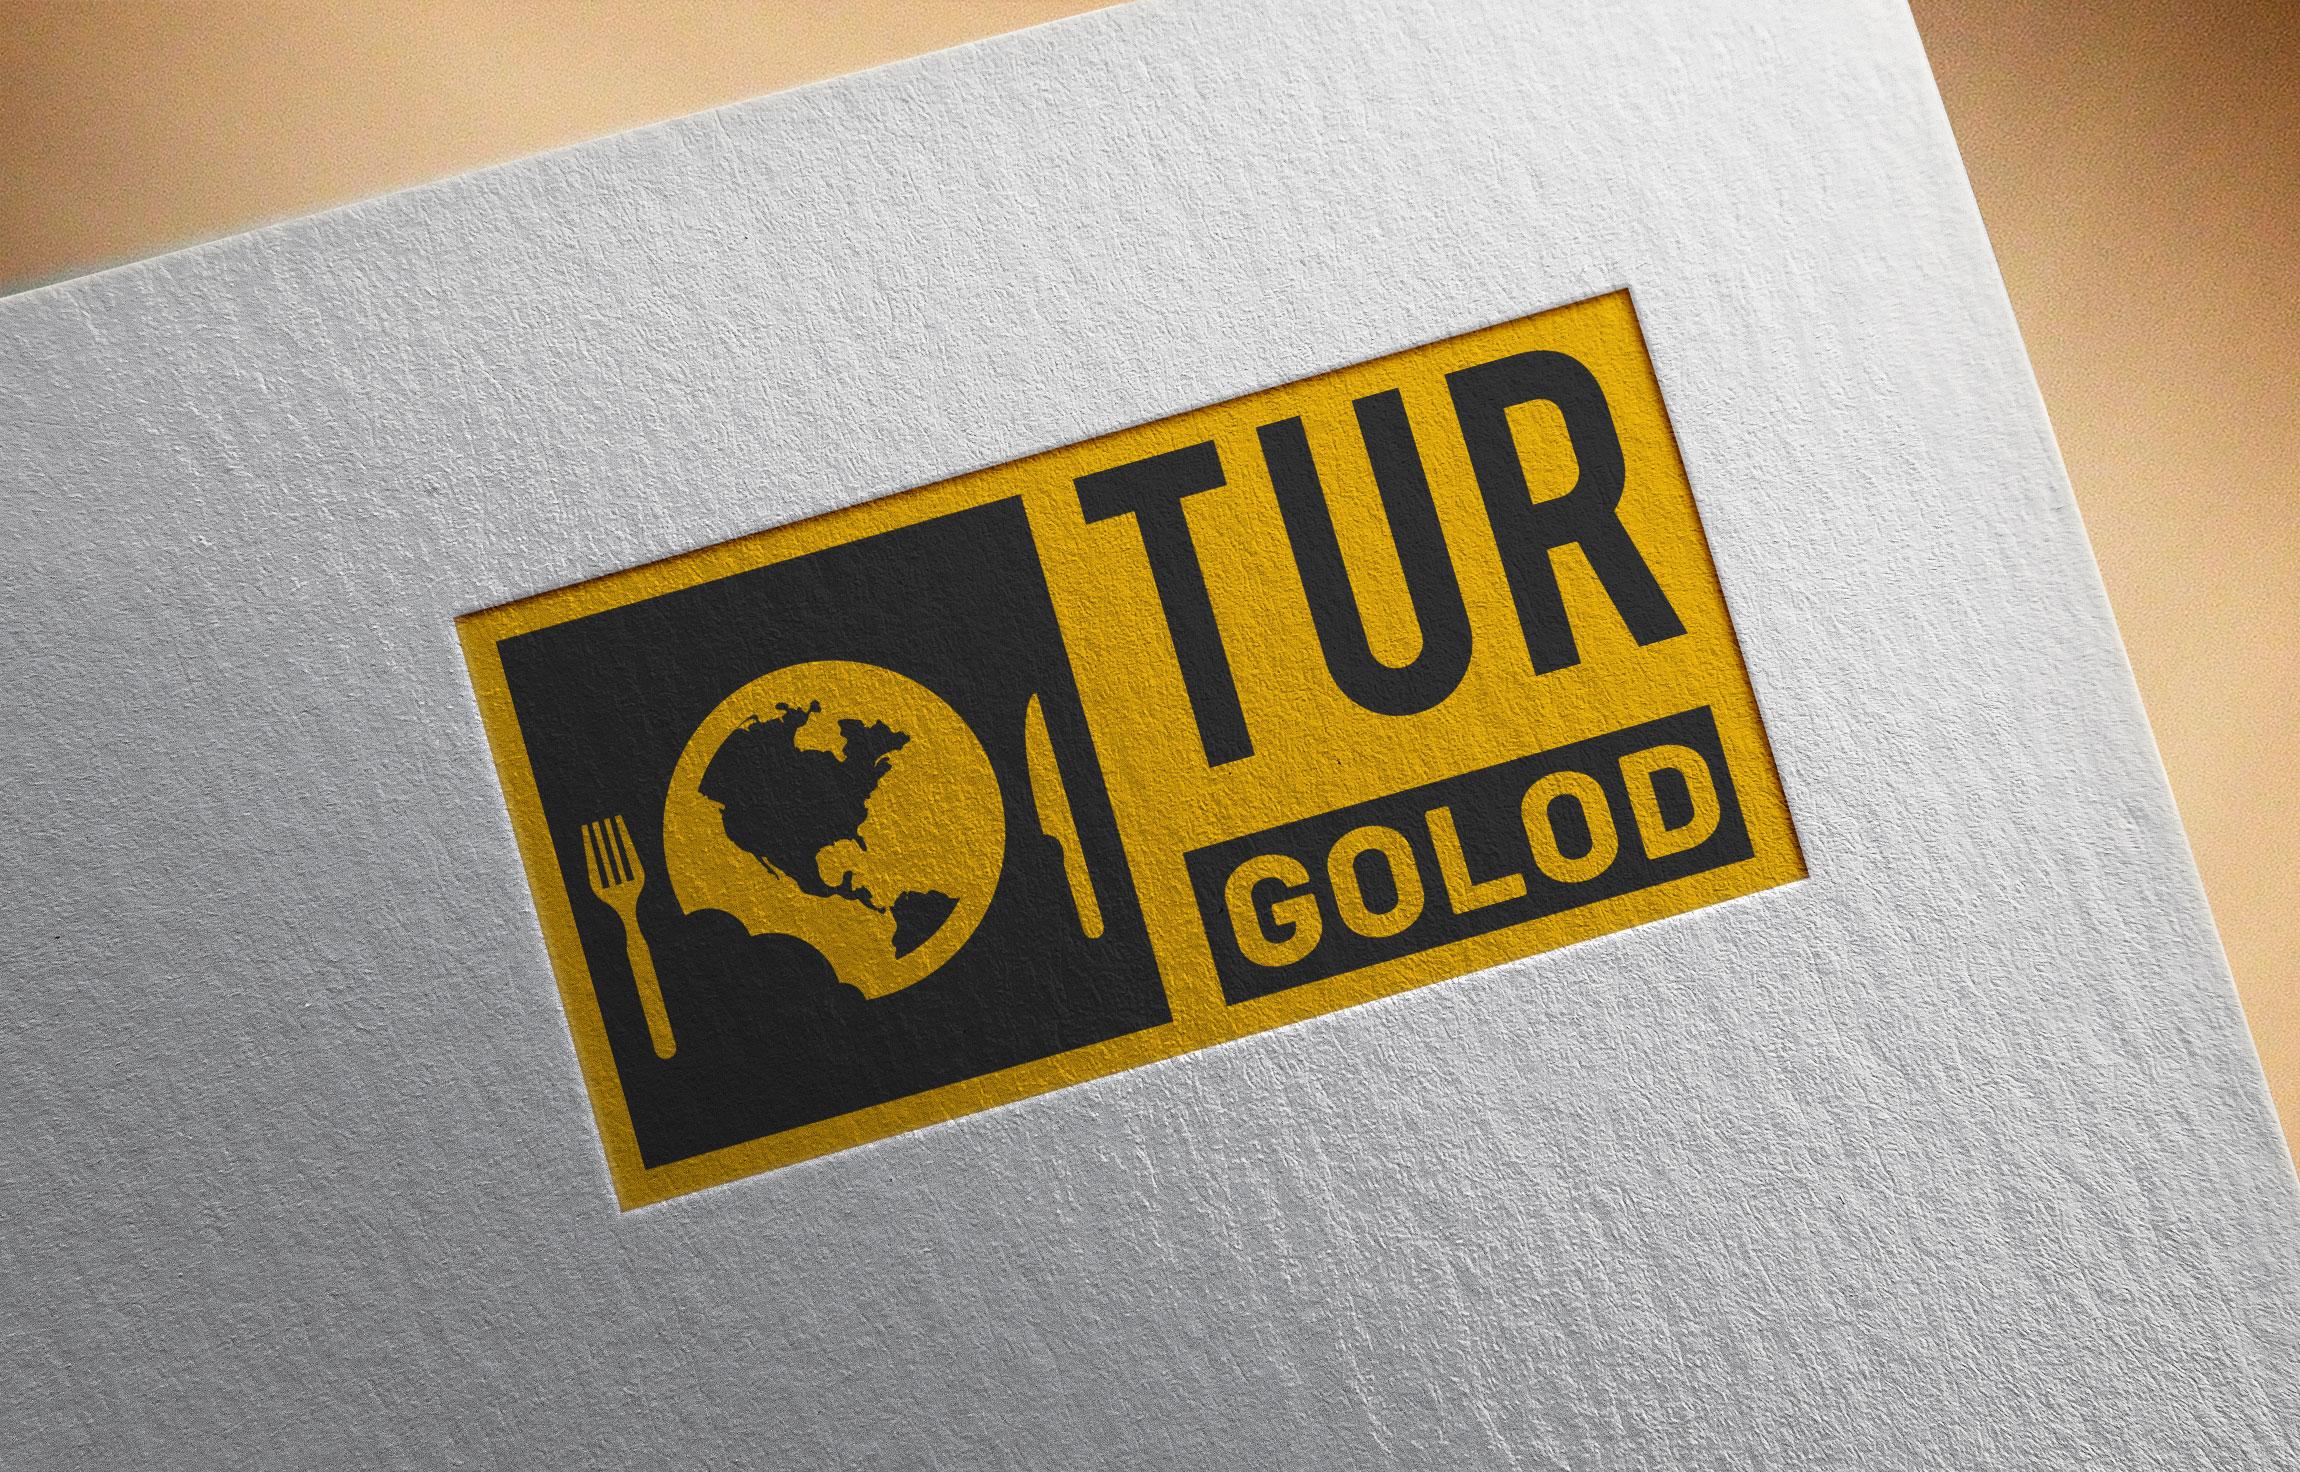 turgolod // онлайн школа